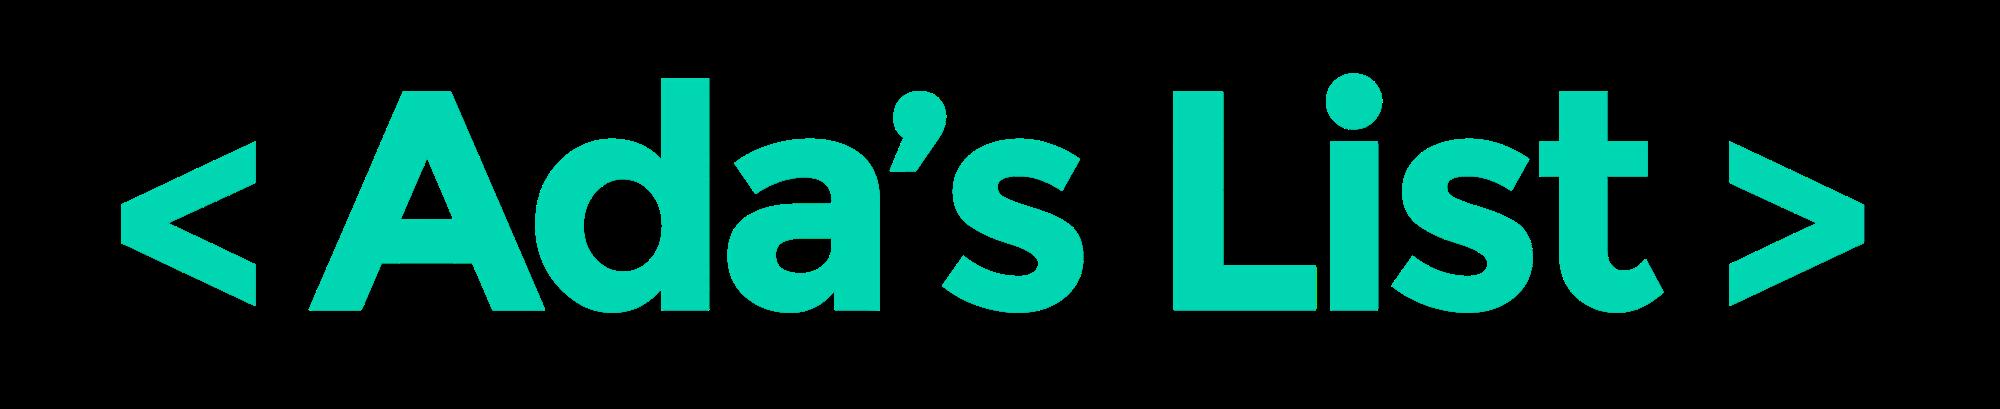 adaslist.png